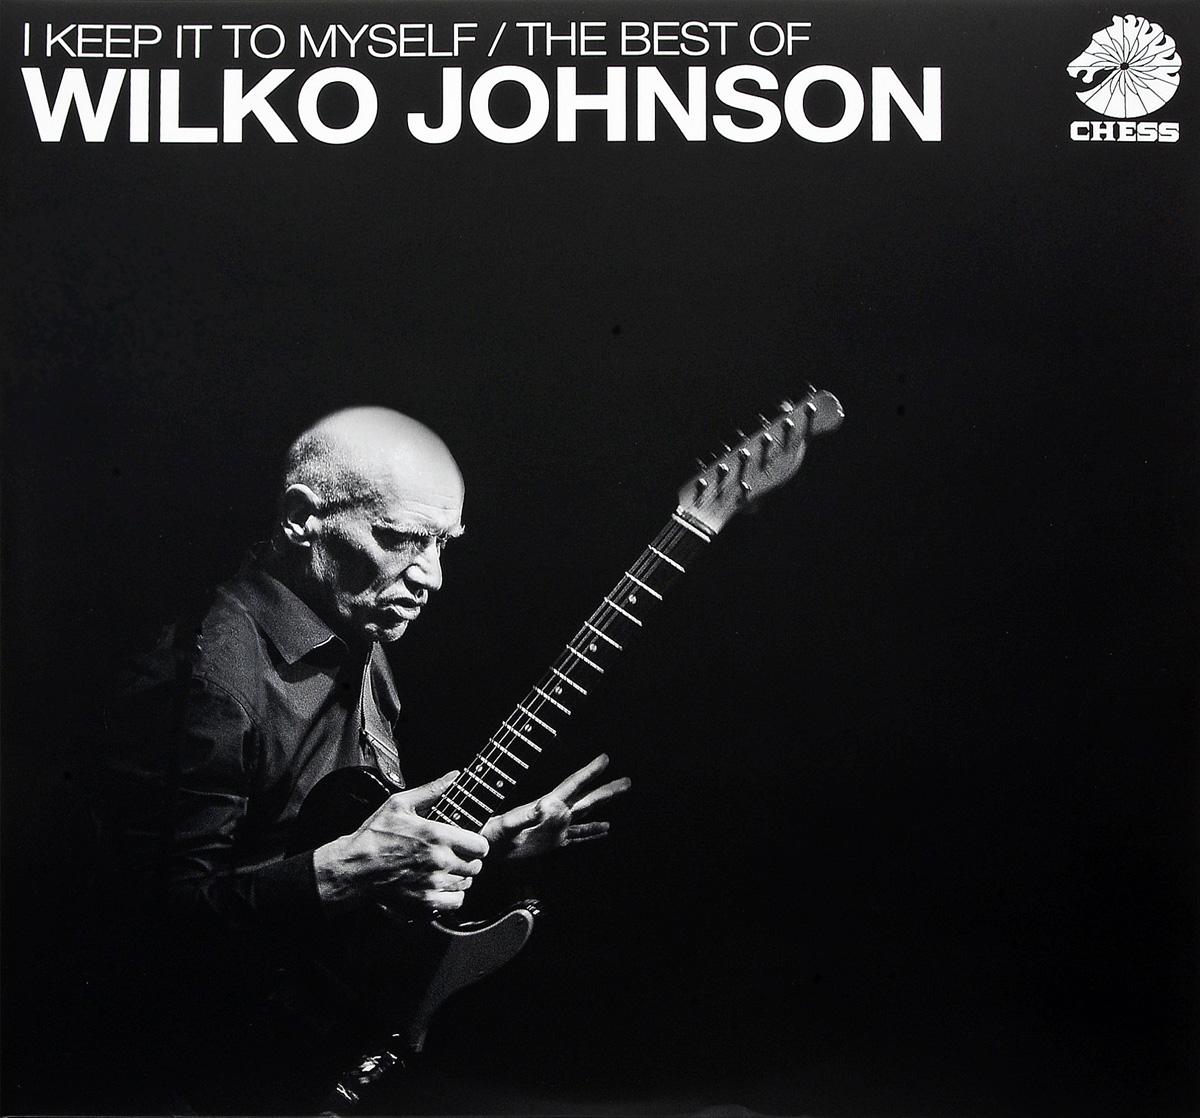 лучшая цена Вилко Джонсон Wilko Johnson. I Keep It To Myself - The Best Of (LP)